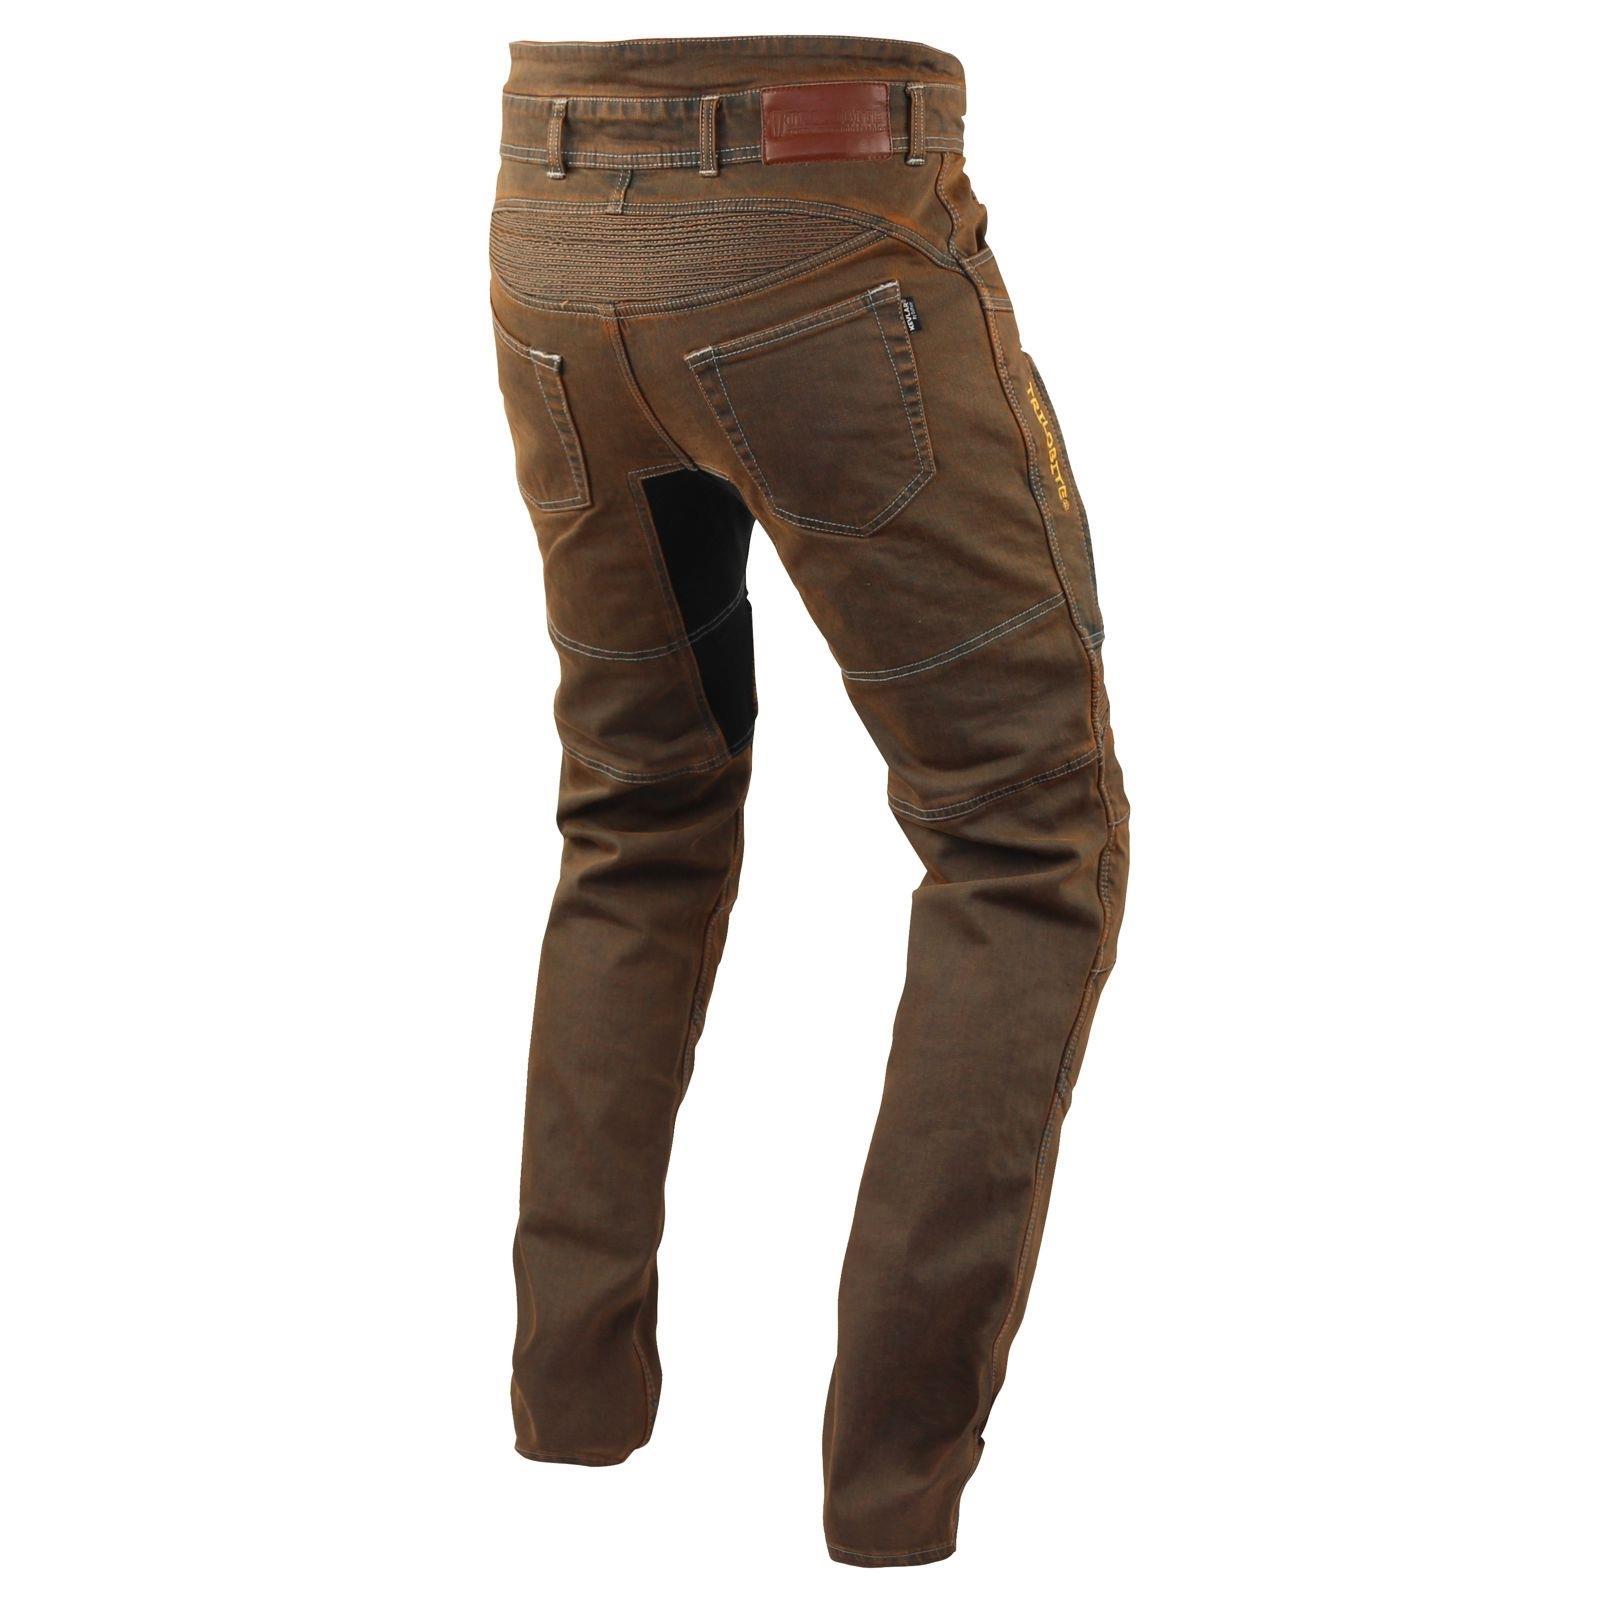 Trilobite-Pantaloni-Moto-Jeans-Abbigliamento-Parado-MICAS-URBAN-DUAL-PANTS-ACID miniatura 108